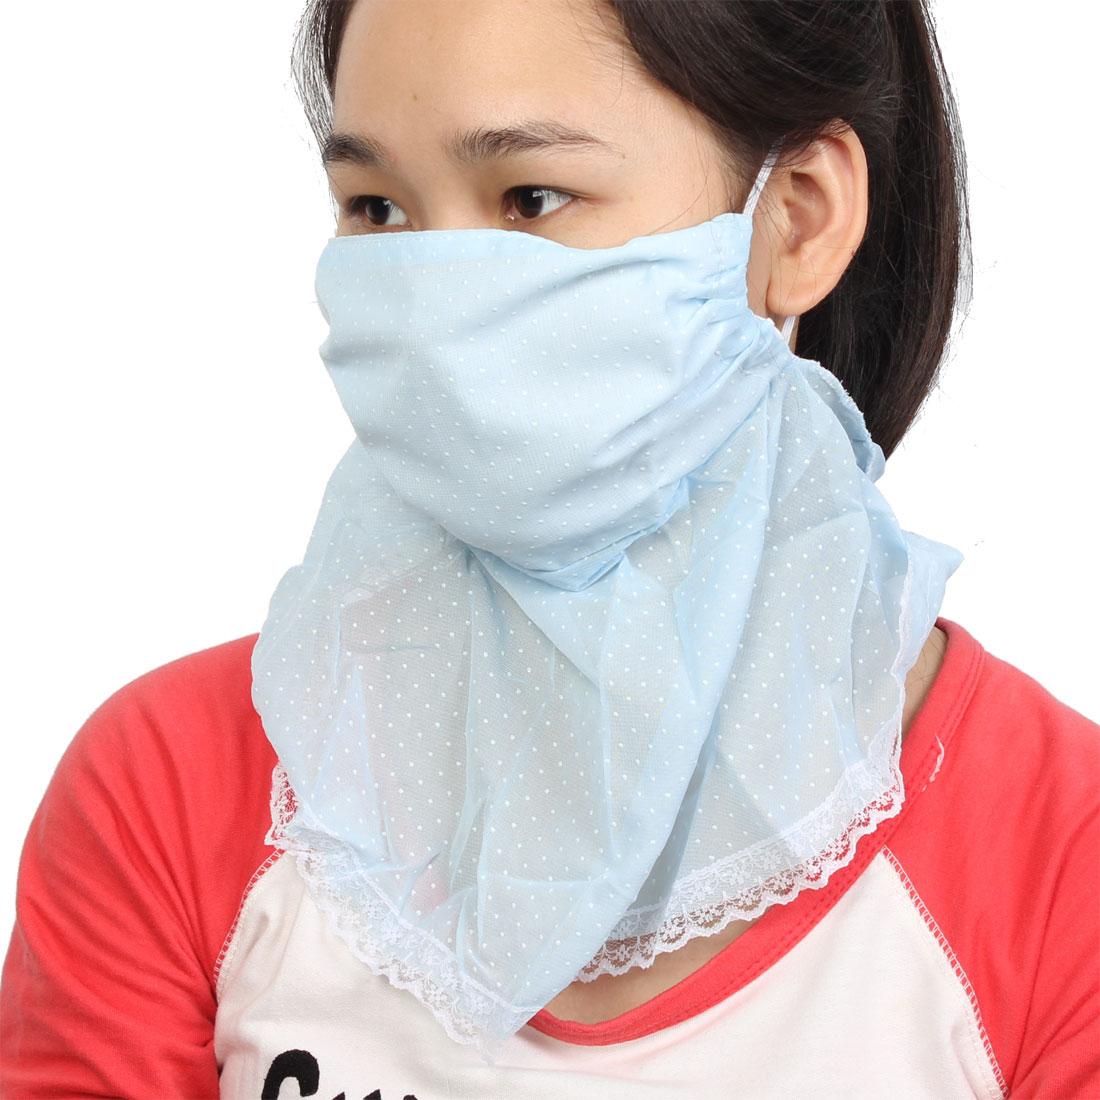 Ladies Pale Blue Lace Brim Detail Neck Protection Windproof Sun Protect Face Mask